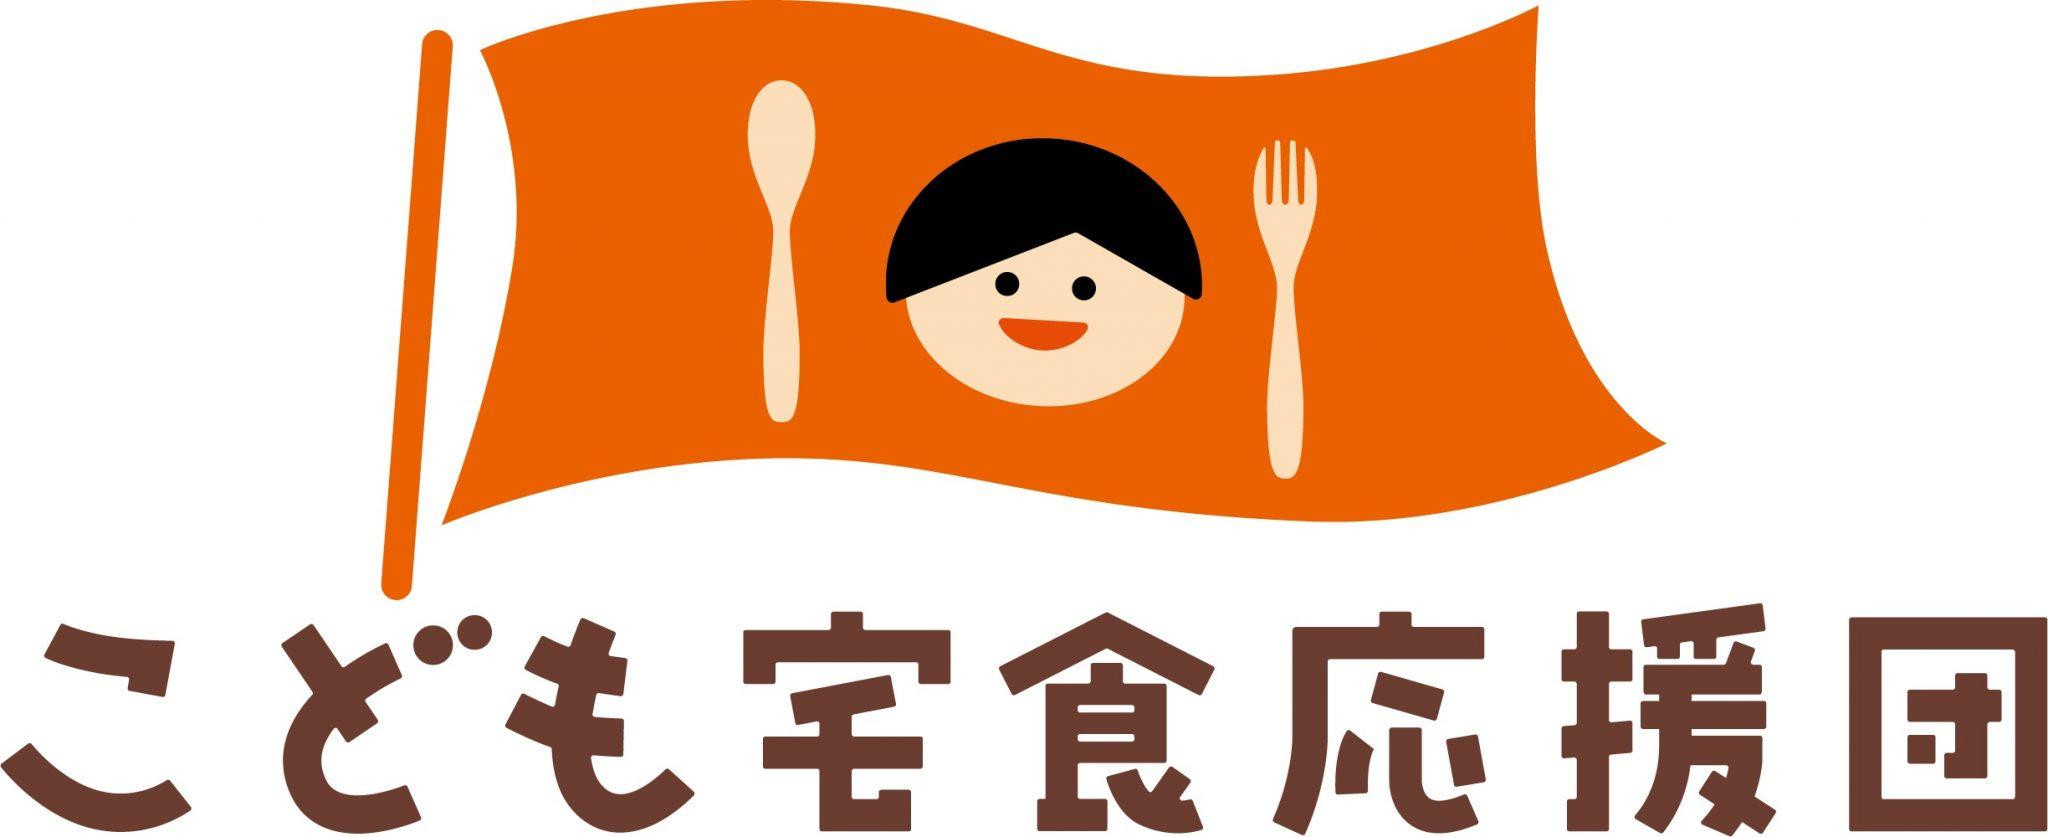 logo0 (1)